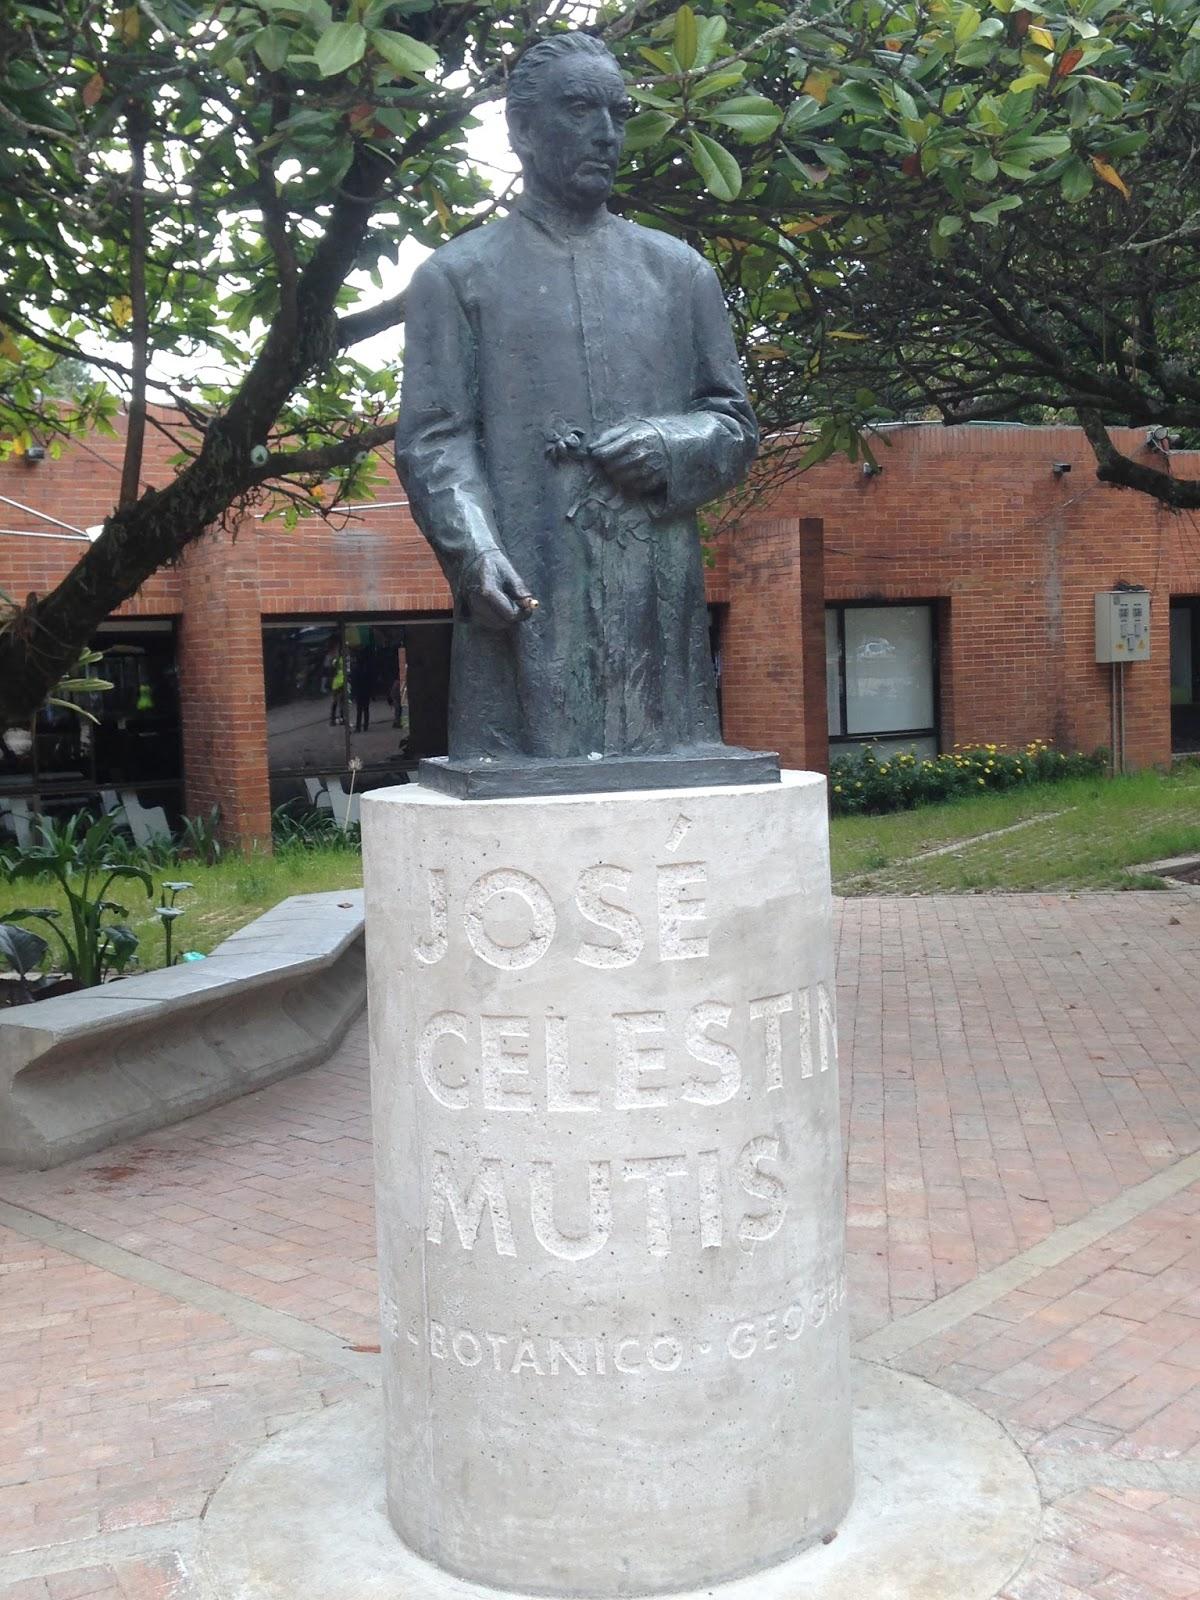 Jardin Botanico Jose Celestino Mutis